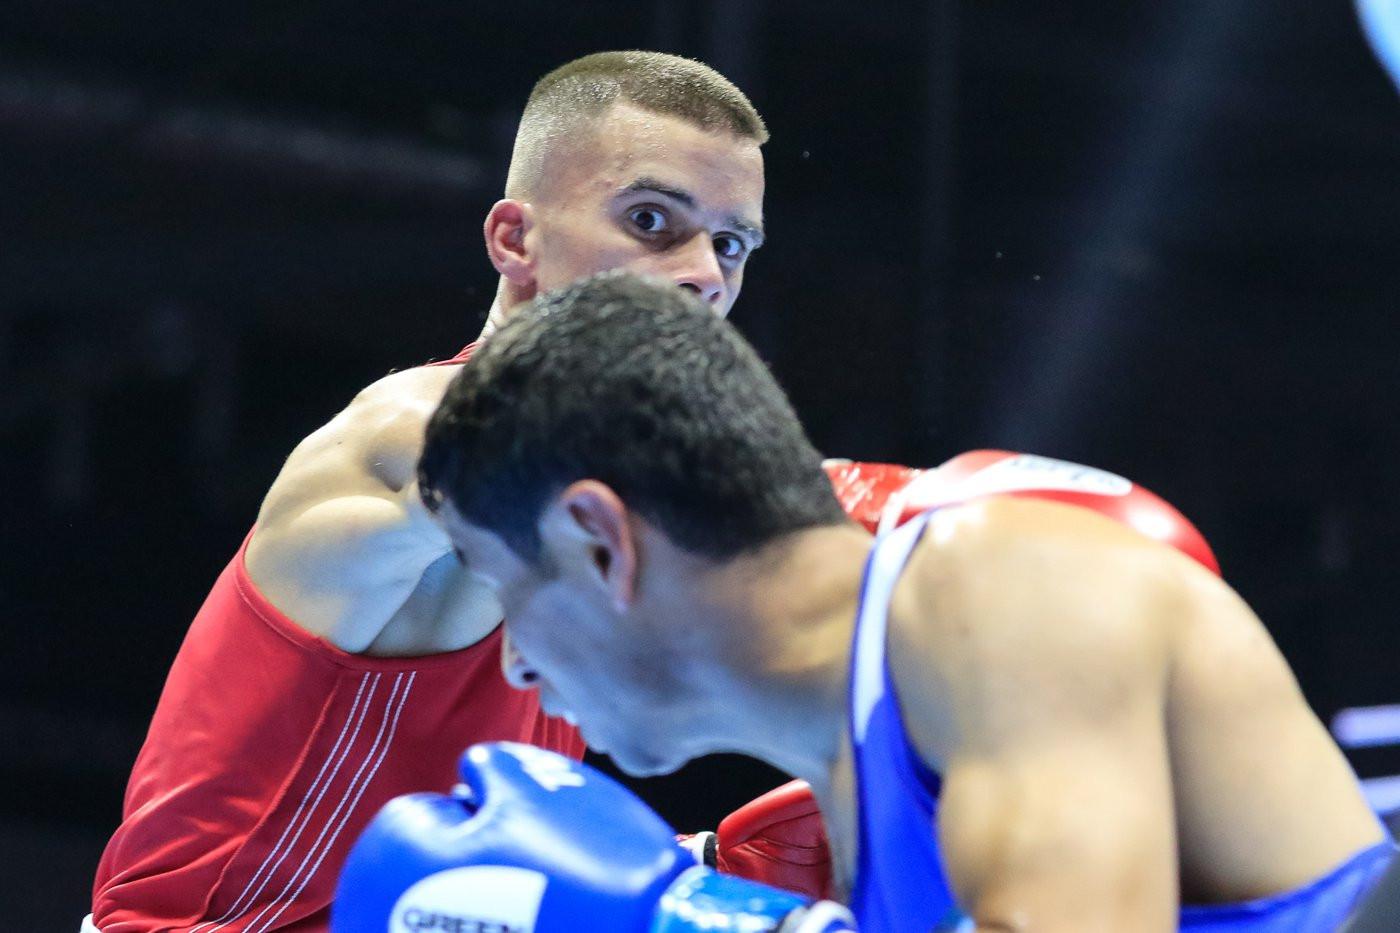 Croatia's Ramon Ferati in red came up against Mohammad Abdelaziz Alwadi of Jordan ©Yekaterinburg 2019